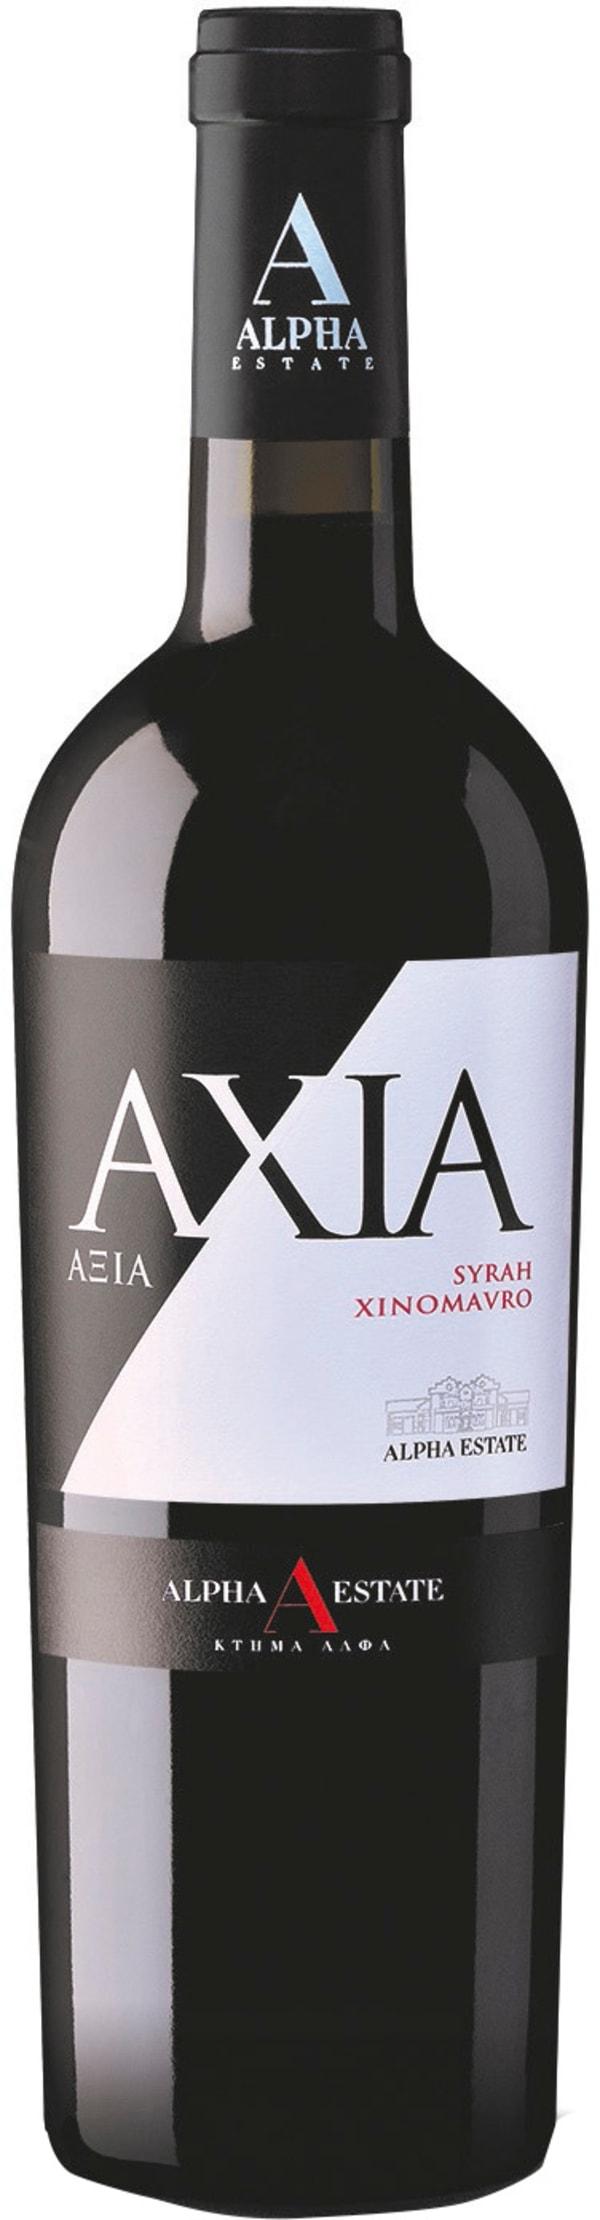 Alpha Estate Axia Syrah Xinomavro 2016